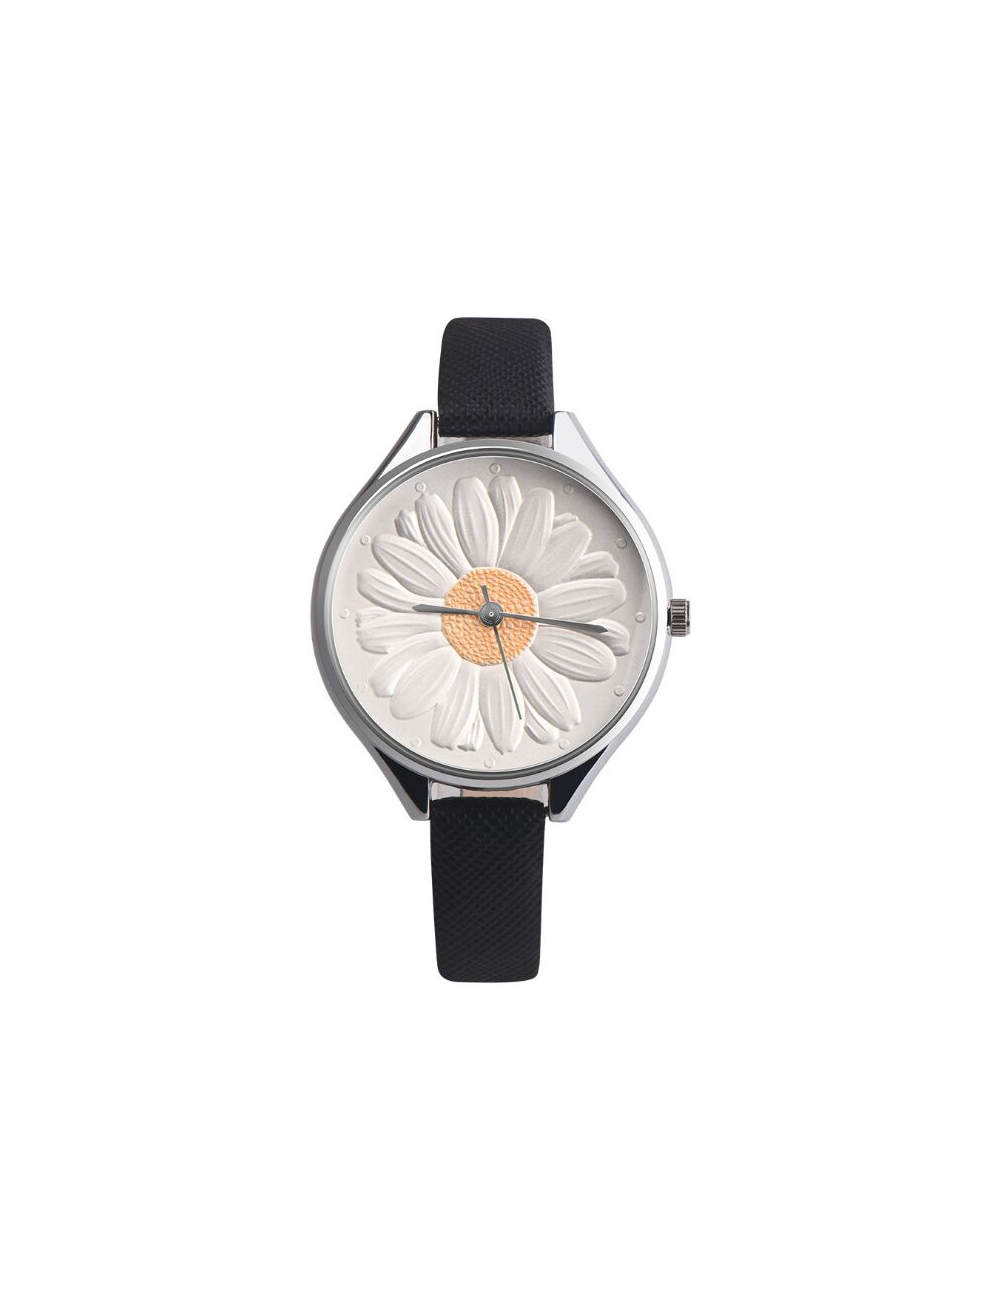 Reloj Margarita Dayoshop 35,900.00